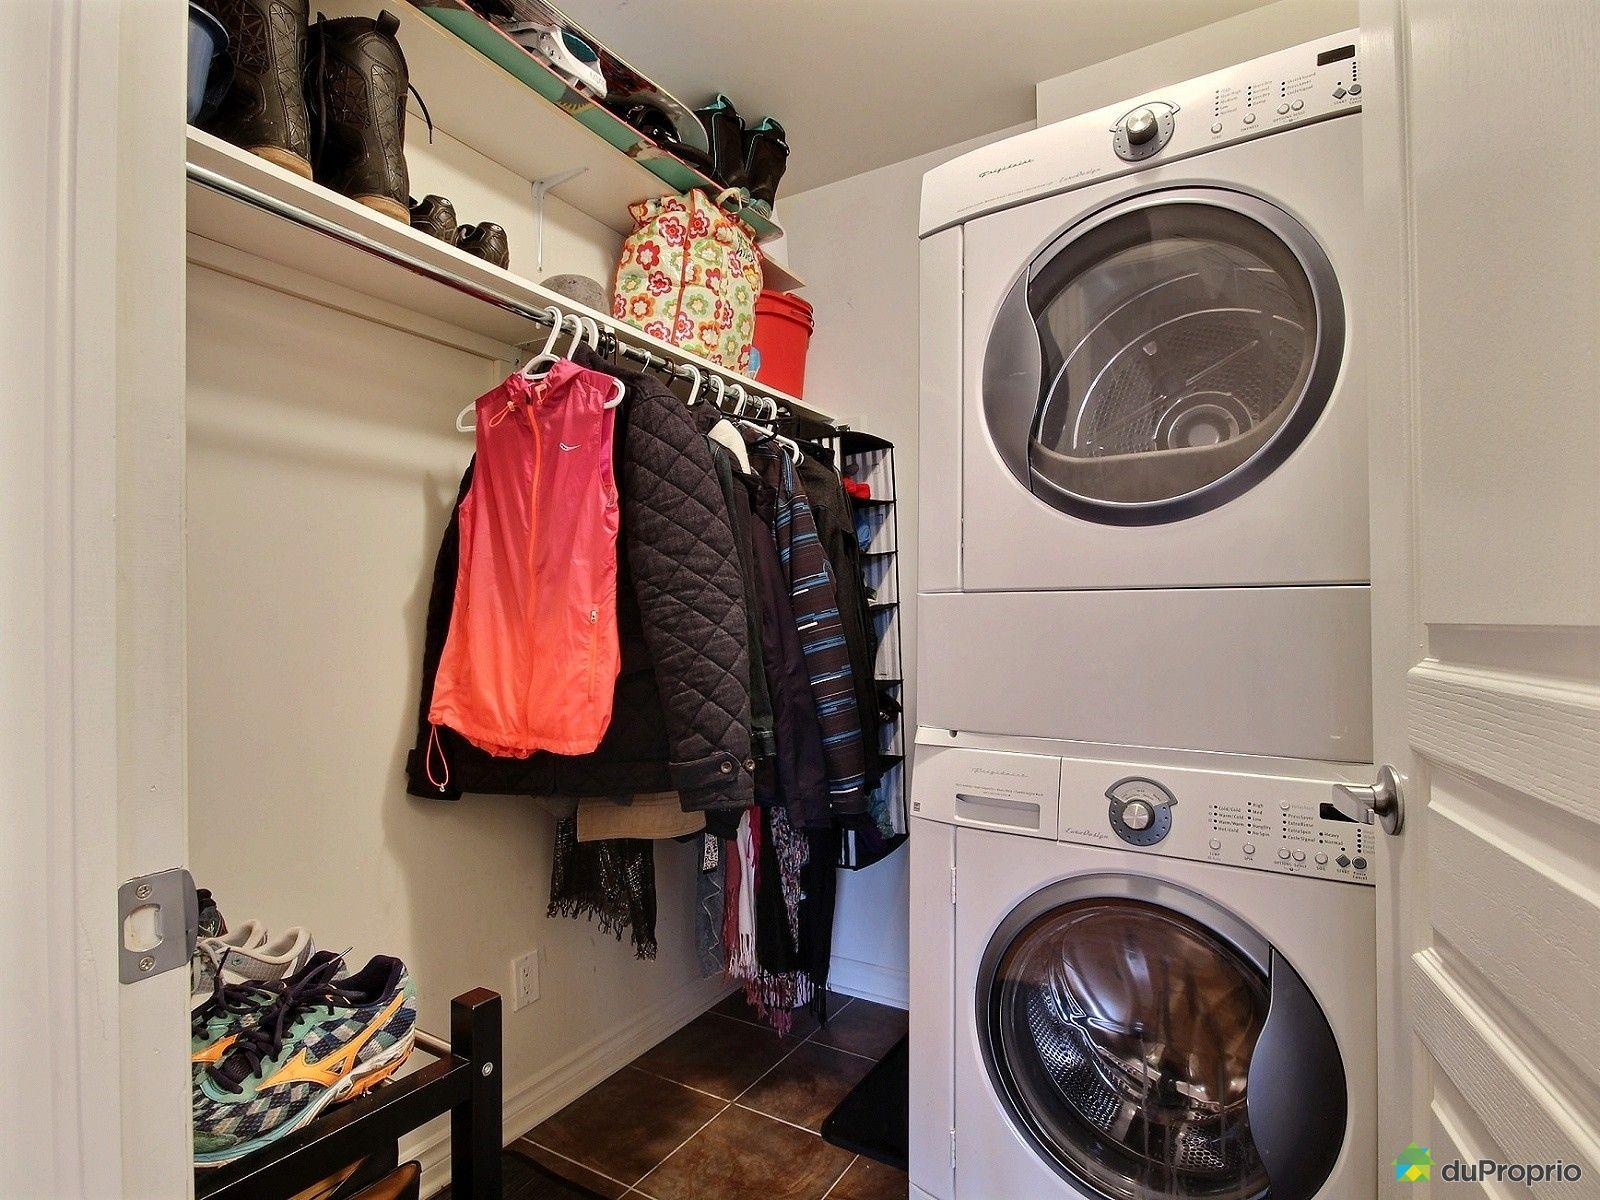 condo vendu montr al immobilier qu bec duproprio 670247. Black Bedroom Furniture Sets. Home Design Ideas